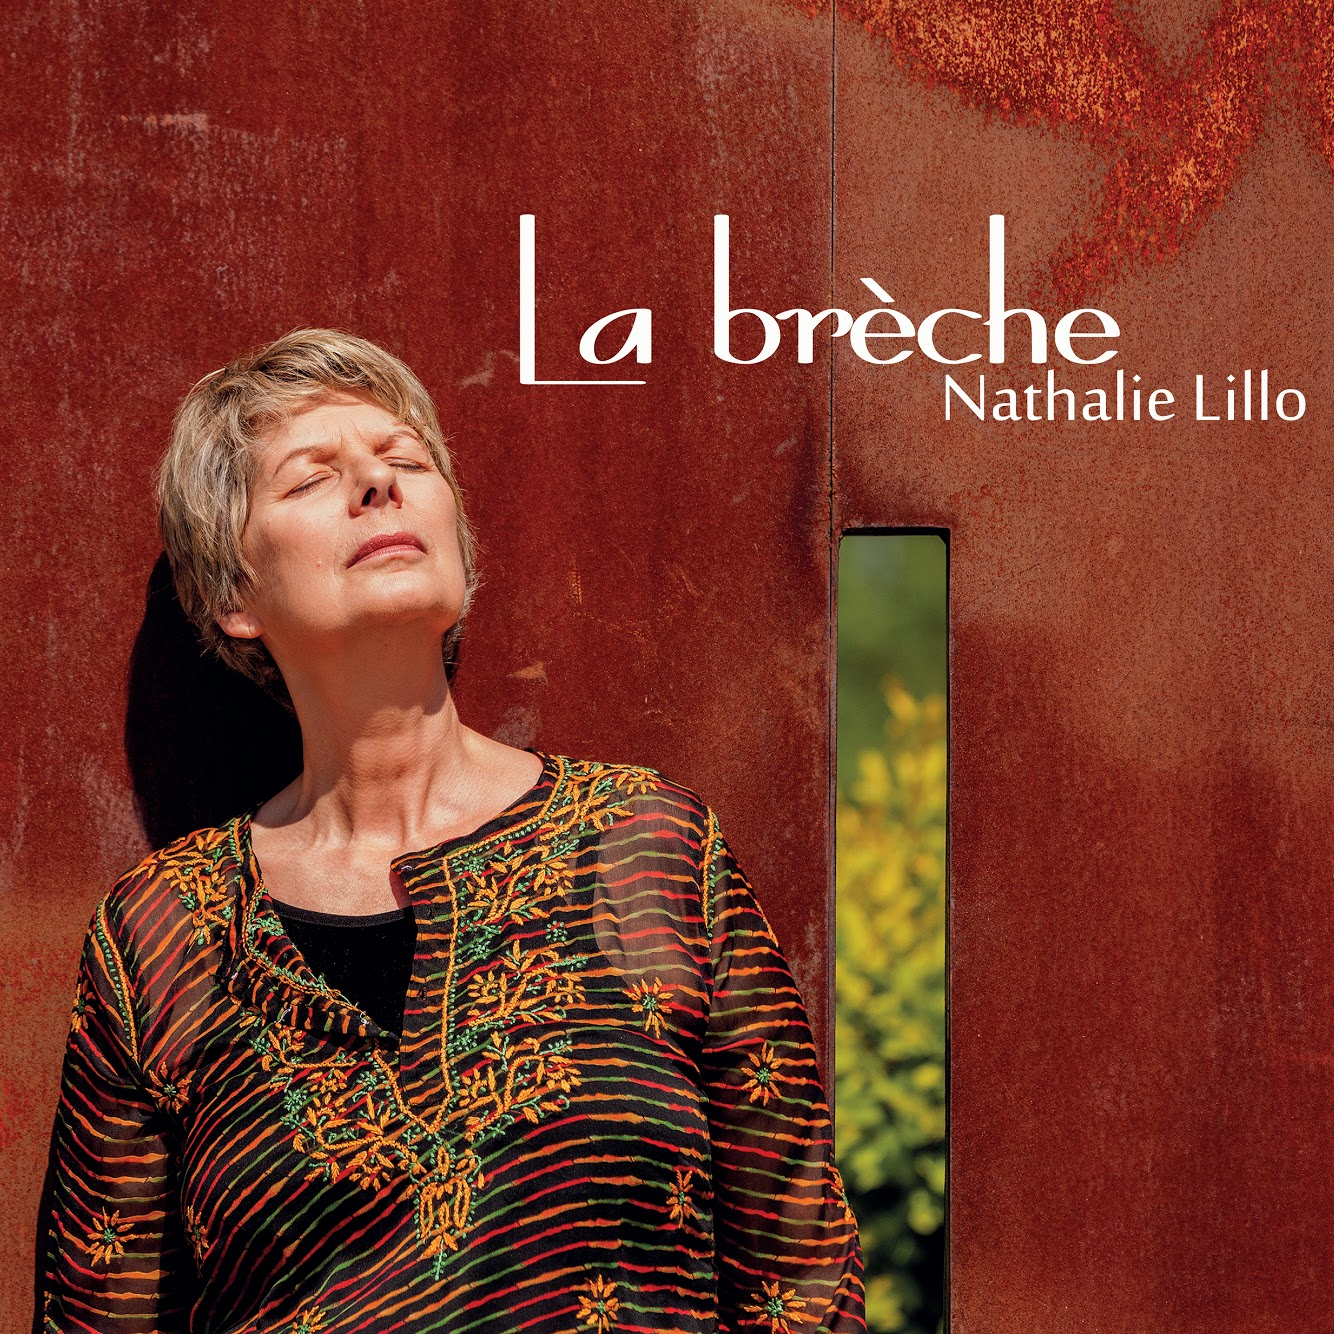 Nathalie Lillo au Forum Léo Ferré